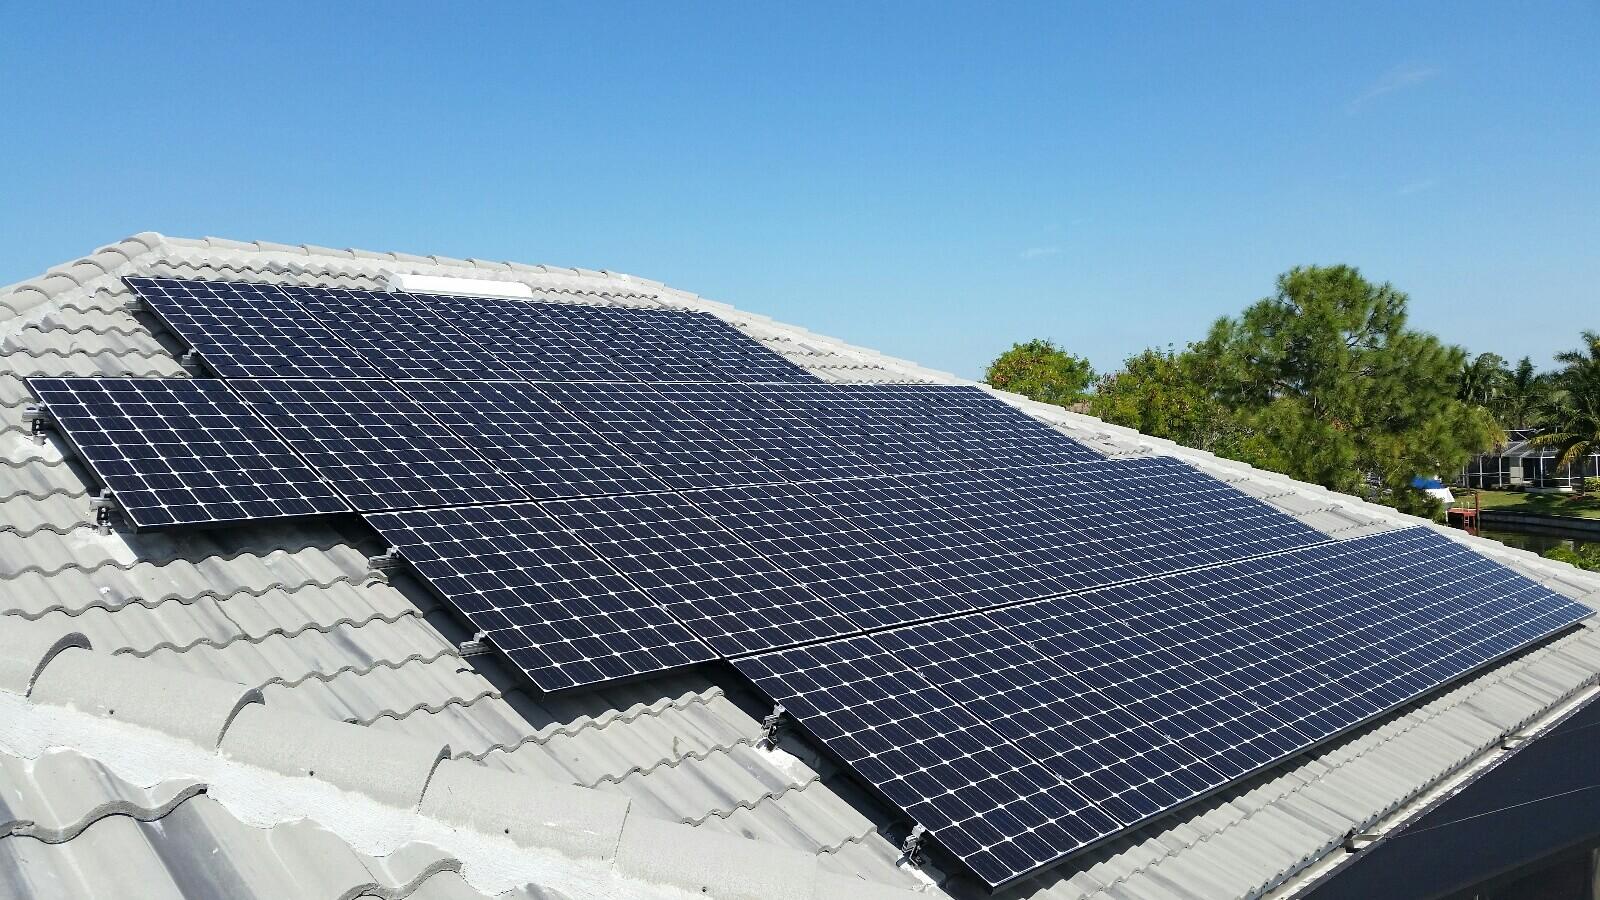 Cape Coral Solar Pv System